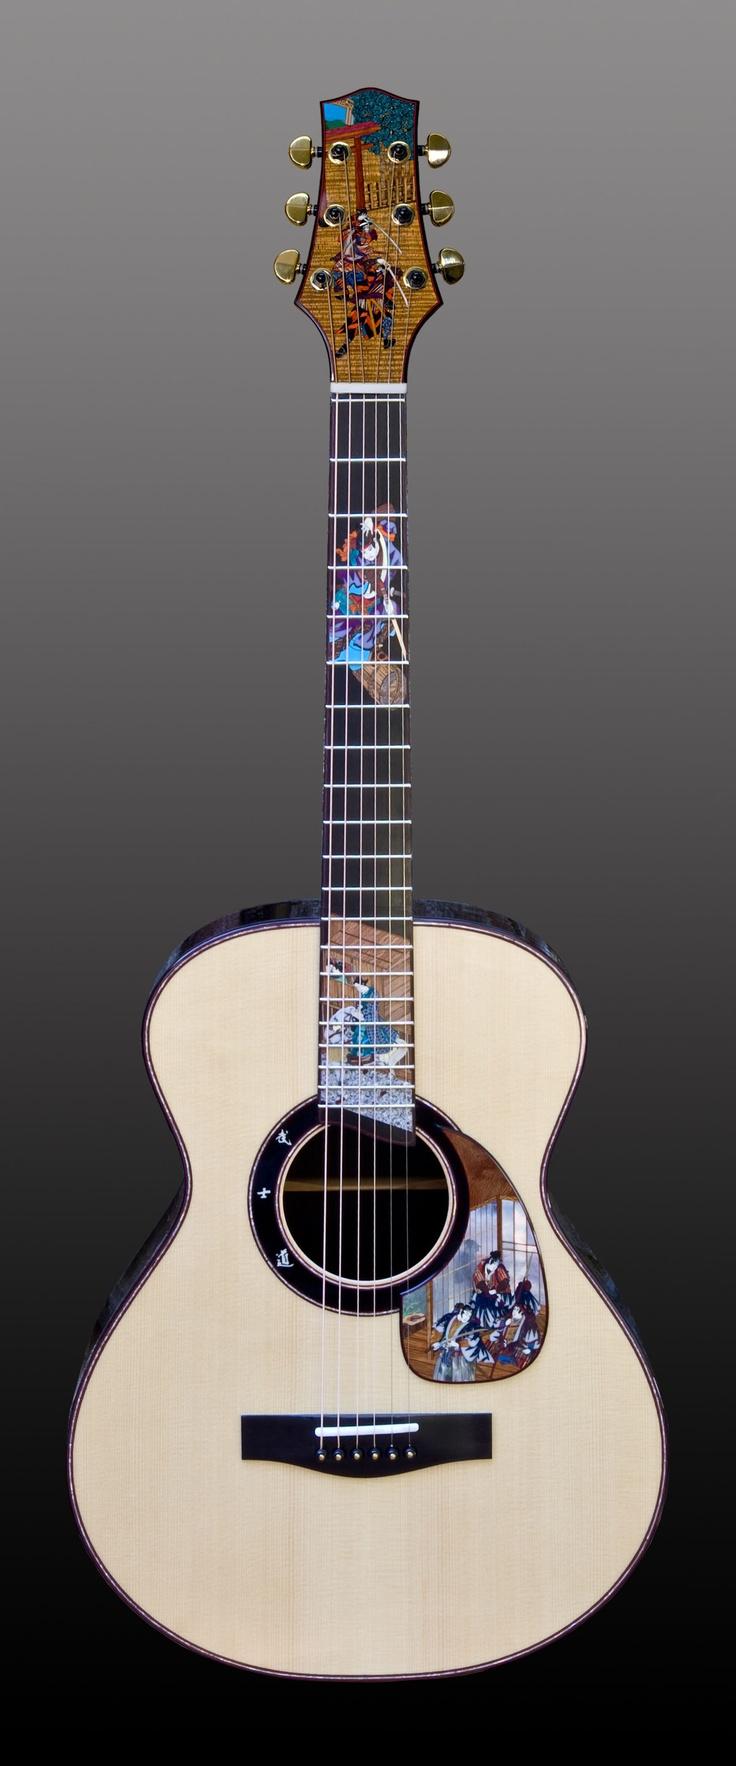 903 best Guitar and Uke images on Pinterest | Guitars, Musical ...